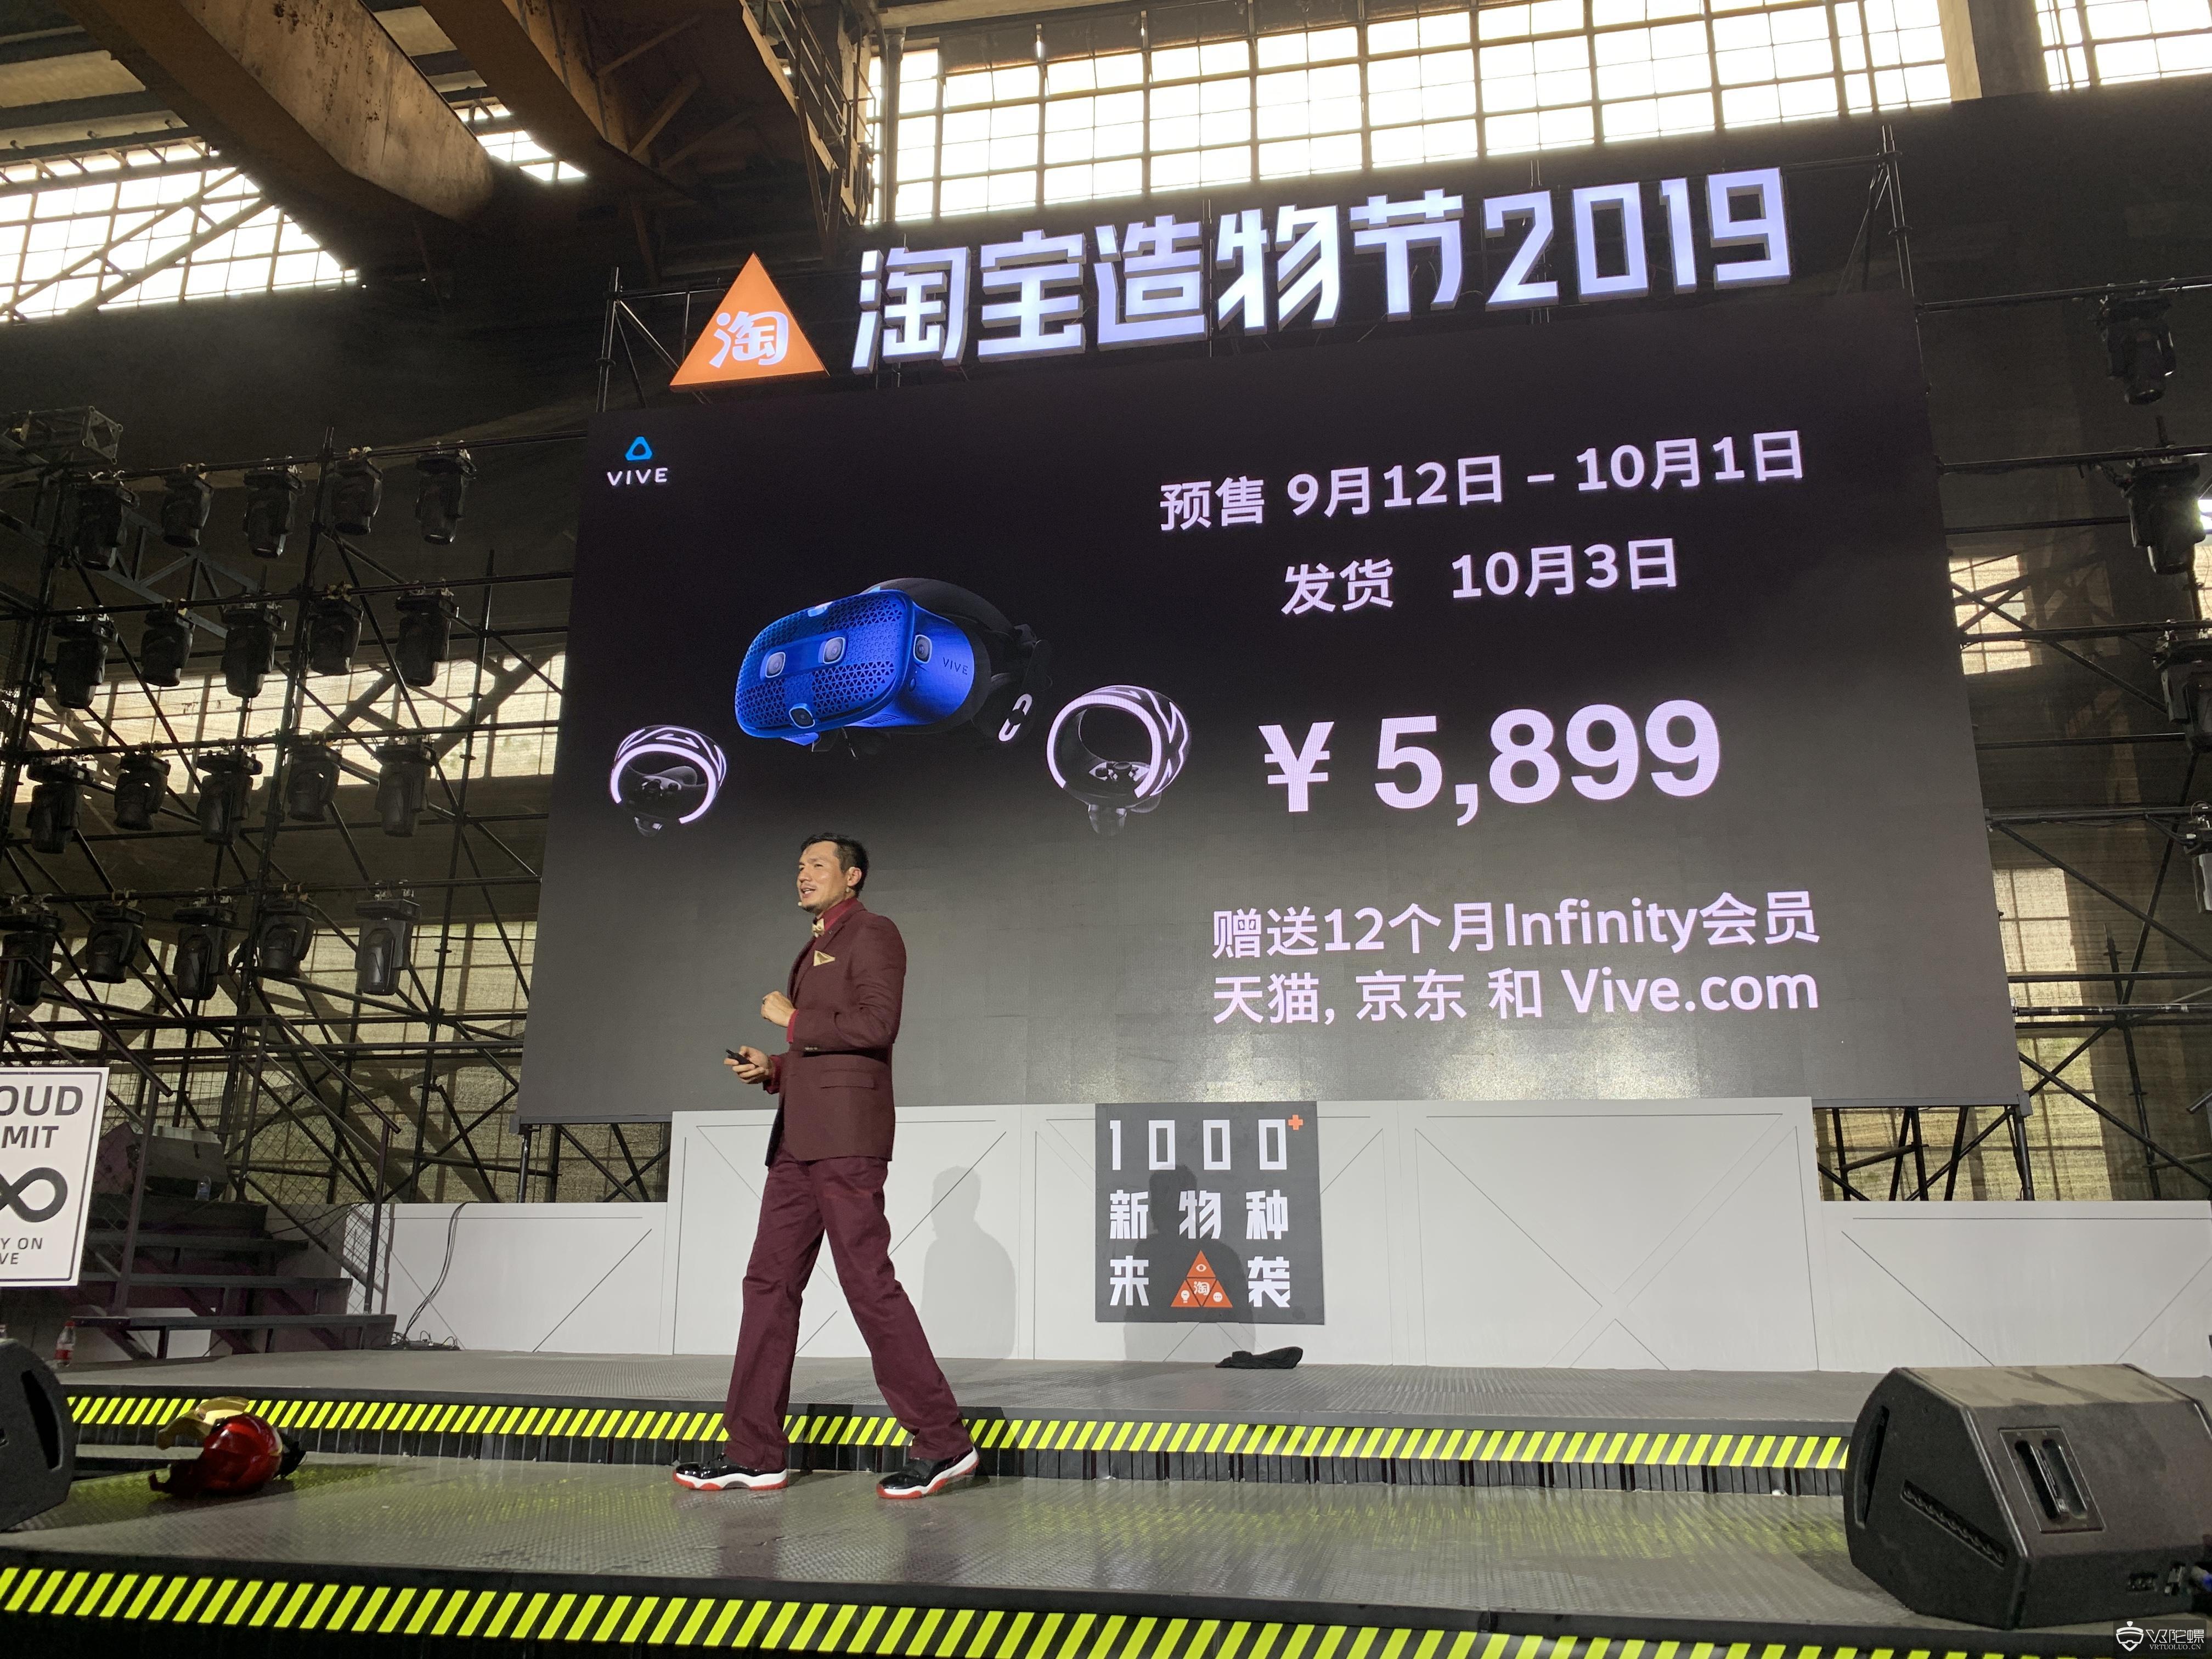 Vive Cosmos正式发布:售价5899元,今日起开放预售